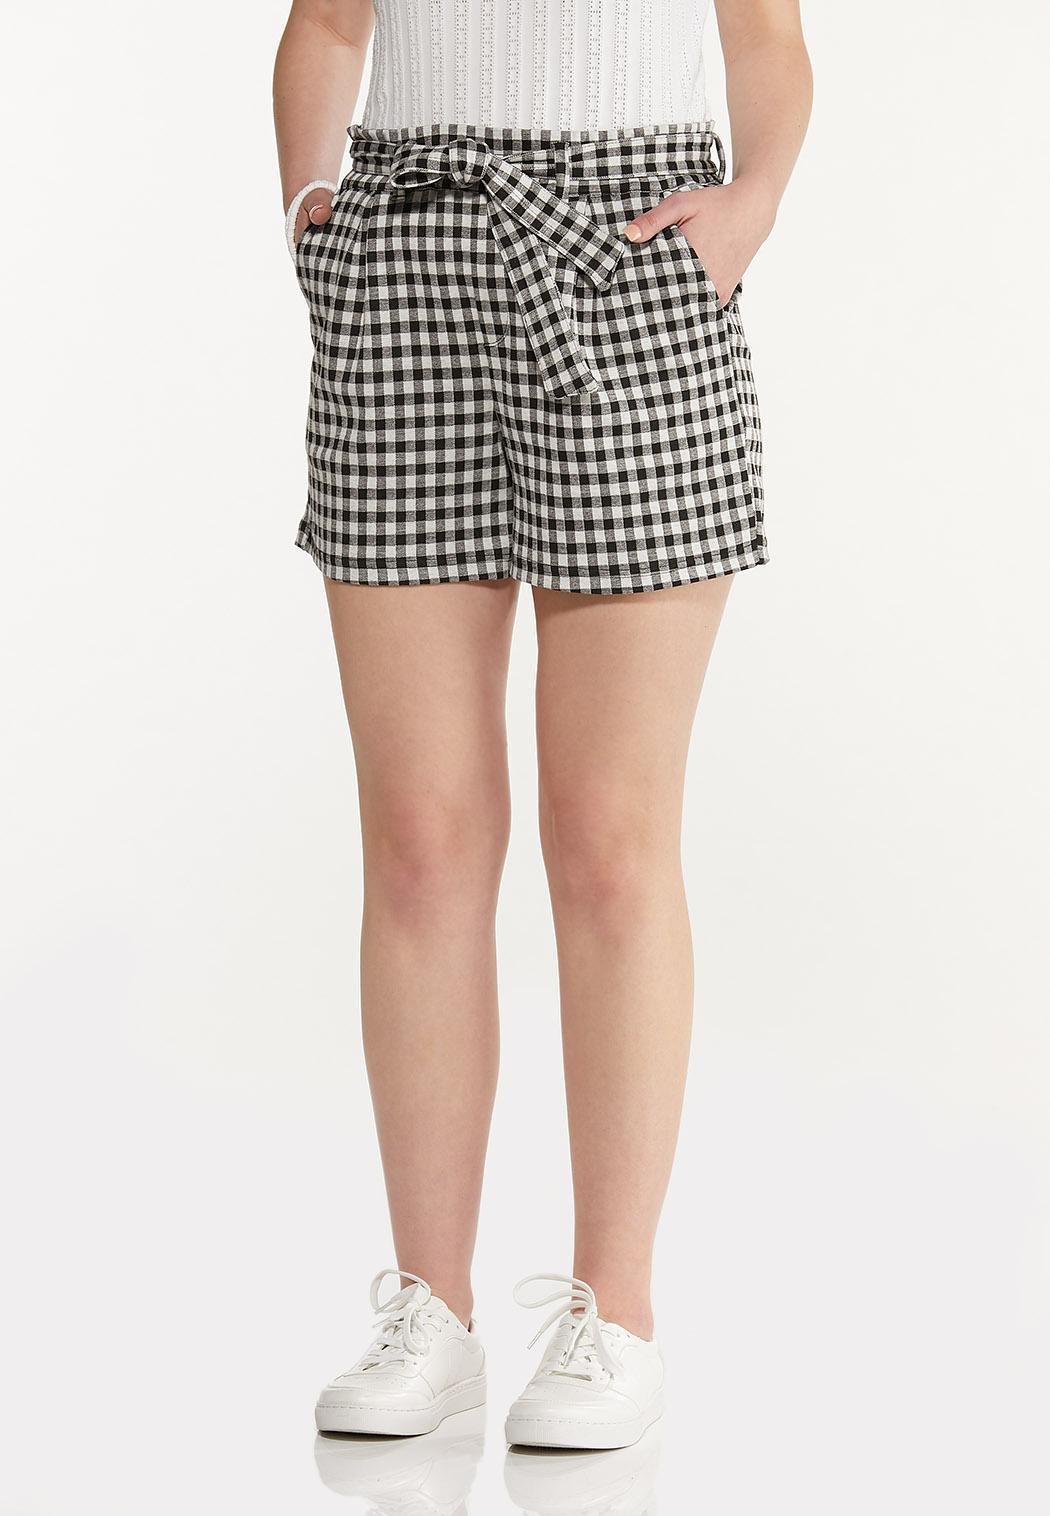 Gingham Self Tie Shorts